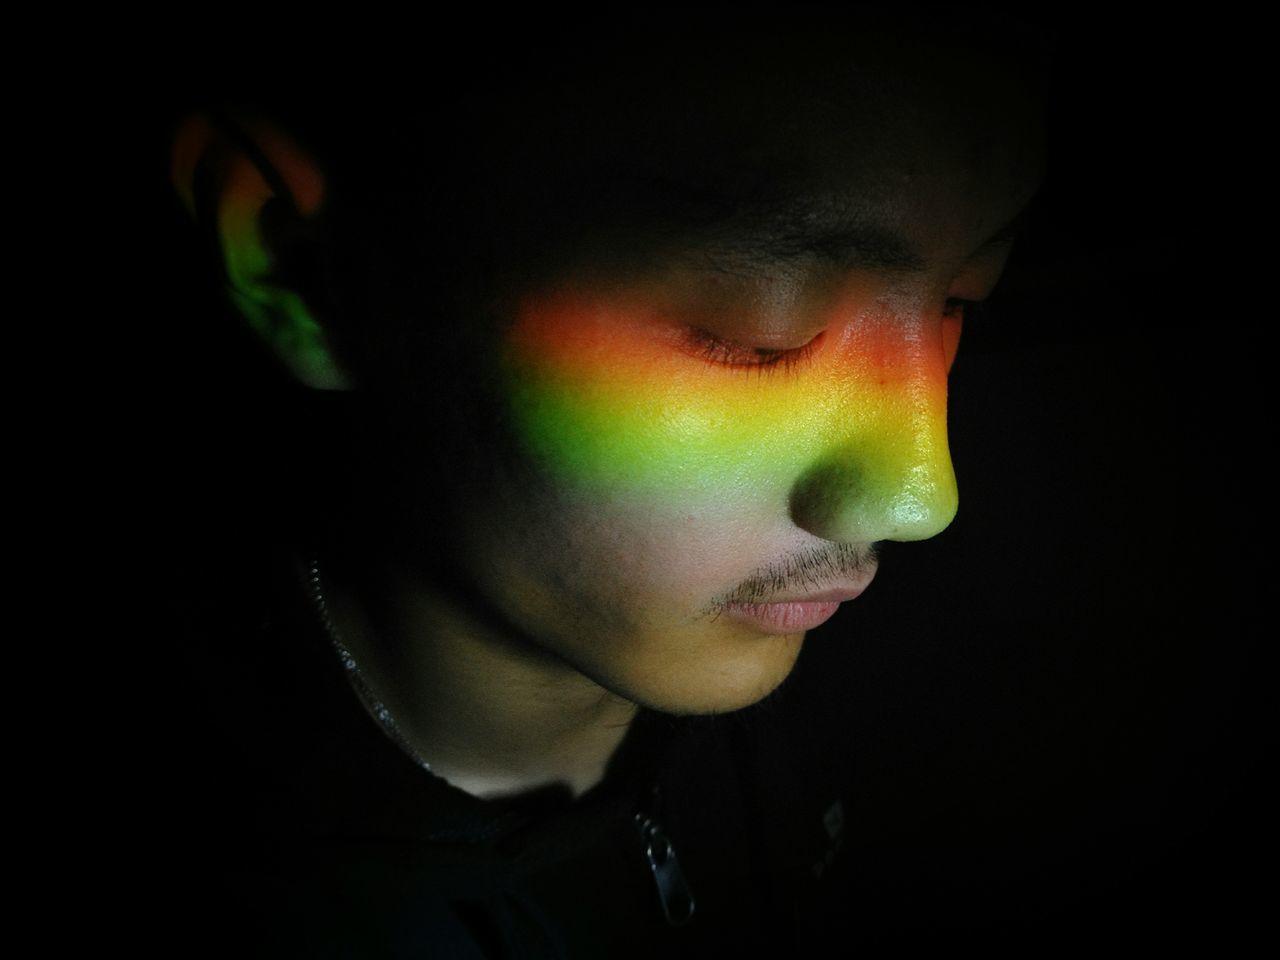 Beautiful stock photos of homosexuell, studio shot, headshot, one person, black background